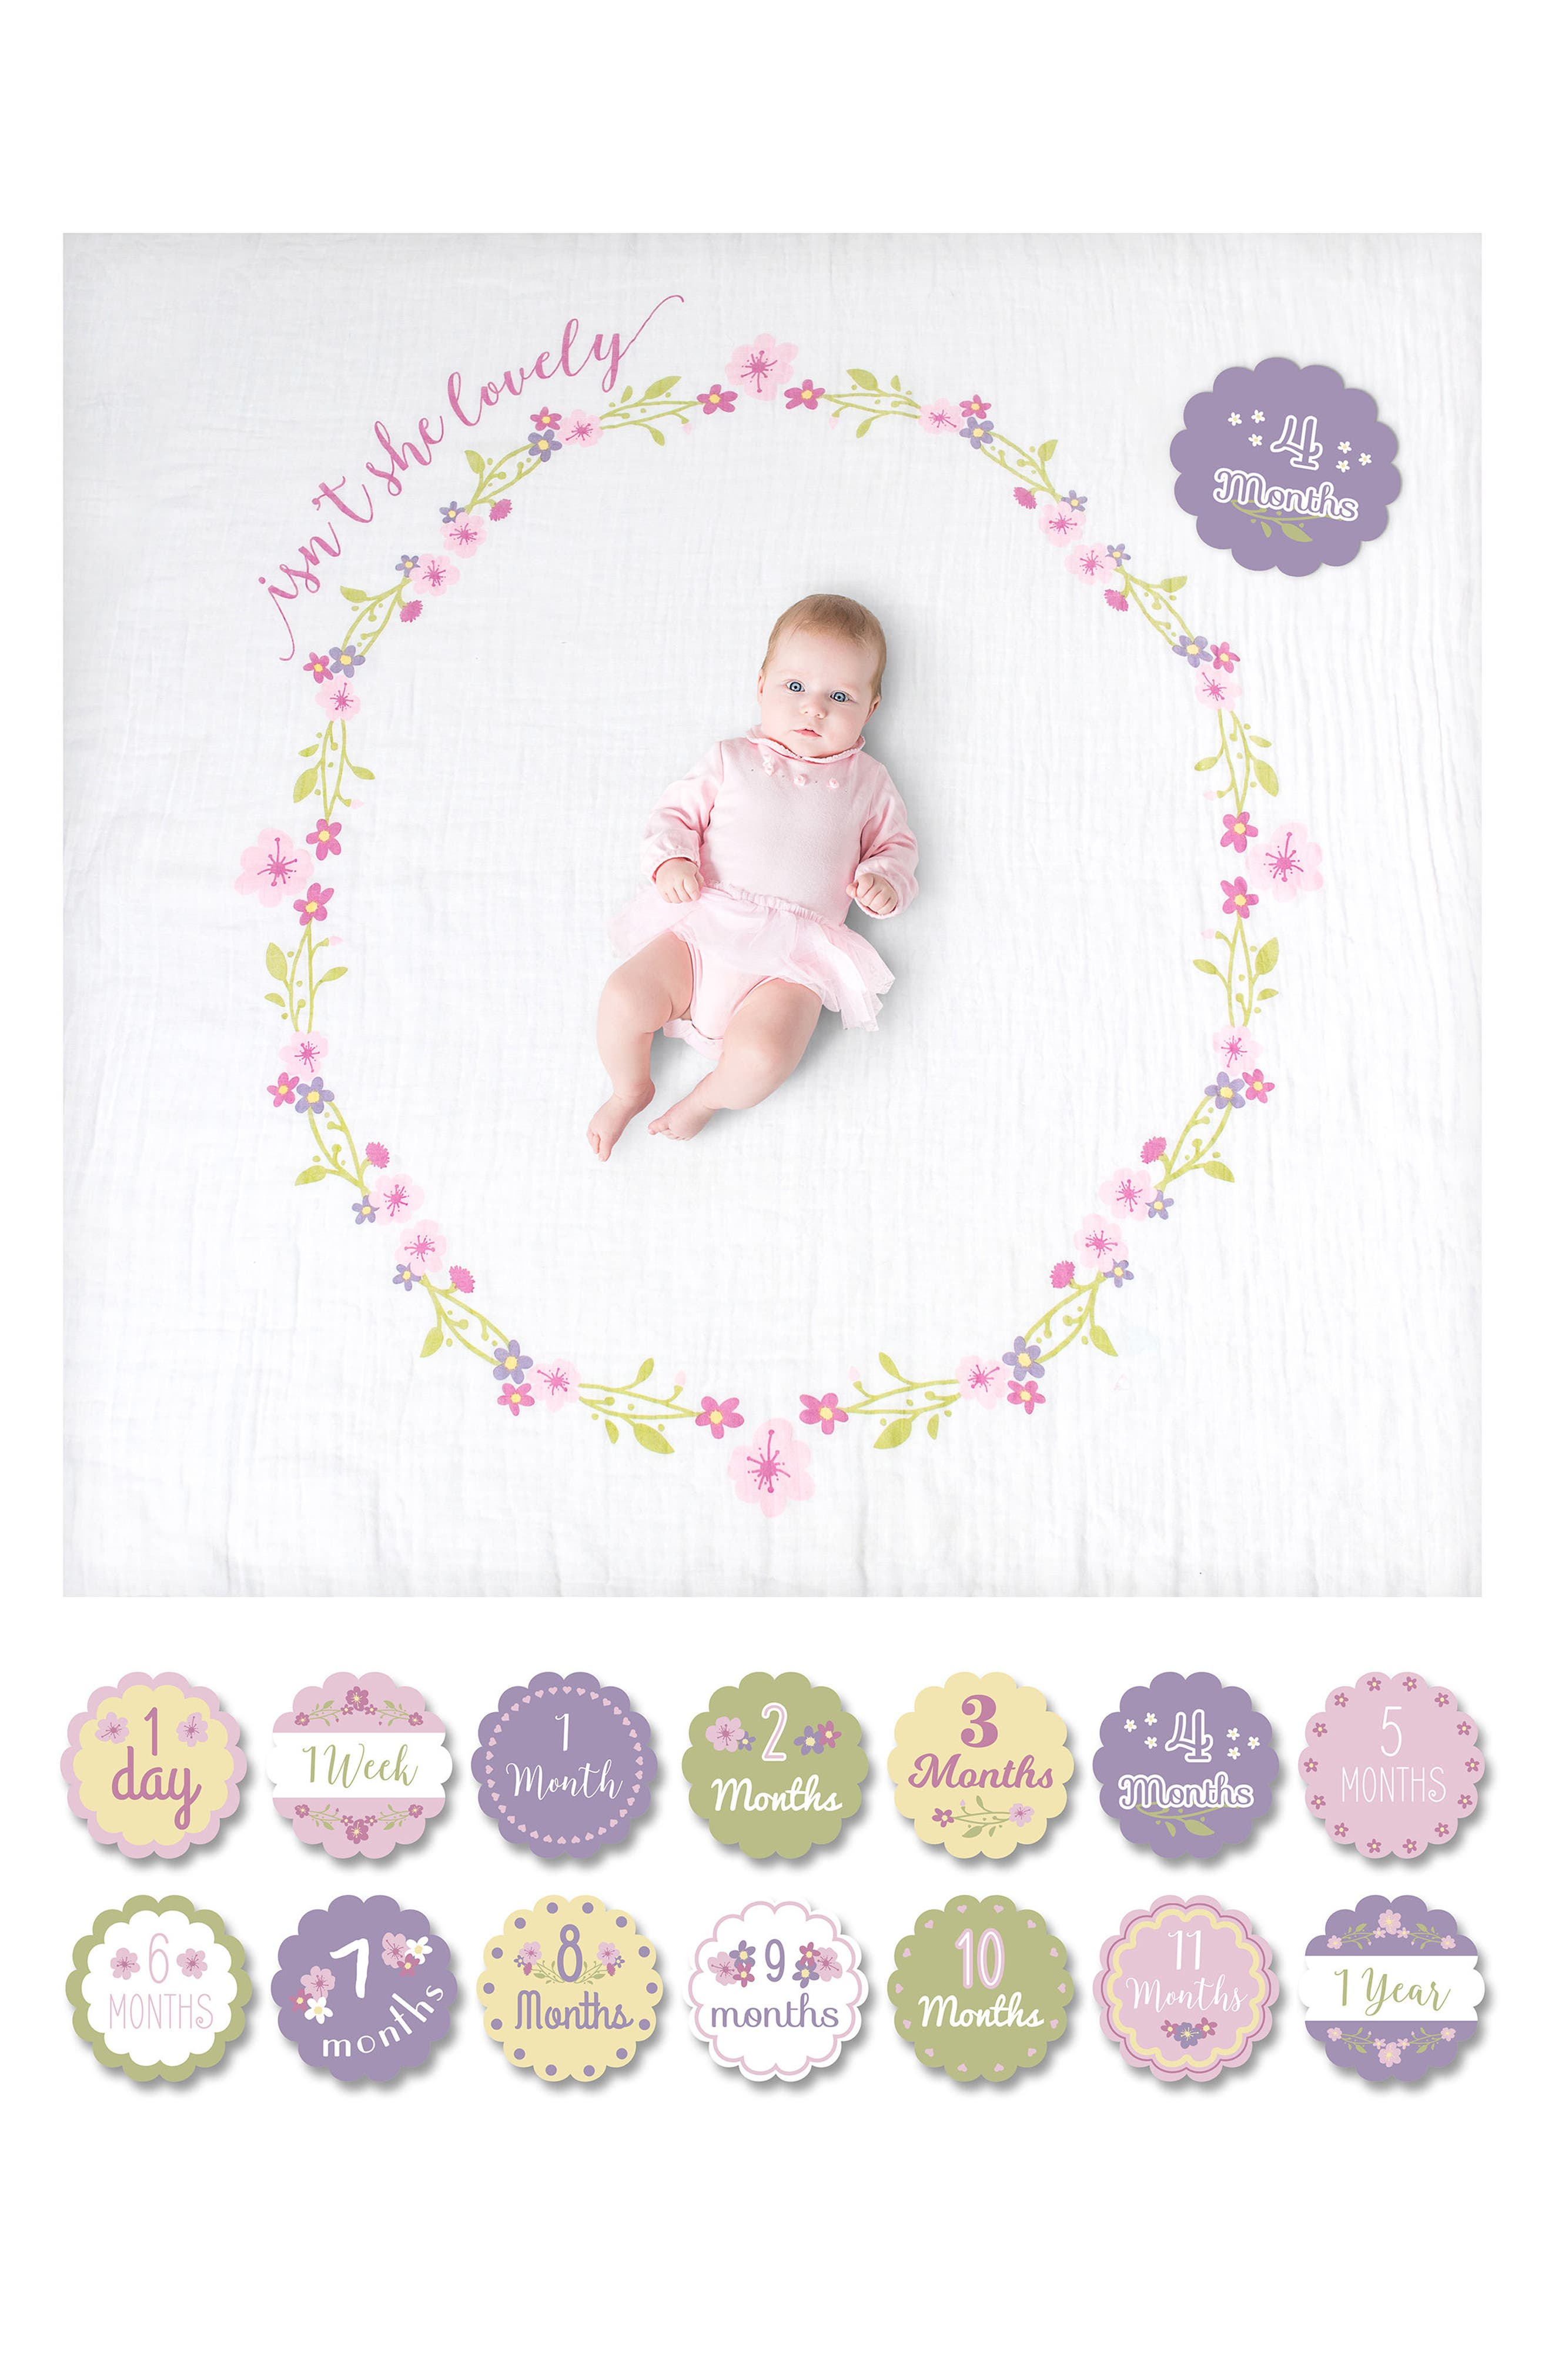 Baby's First Year - Isn't She Lovely Muslin Blanket & Milestone Card Set,                             Alternate thumbnail 2, color,                             Isnt She Lovey